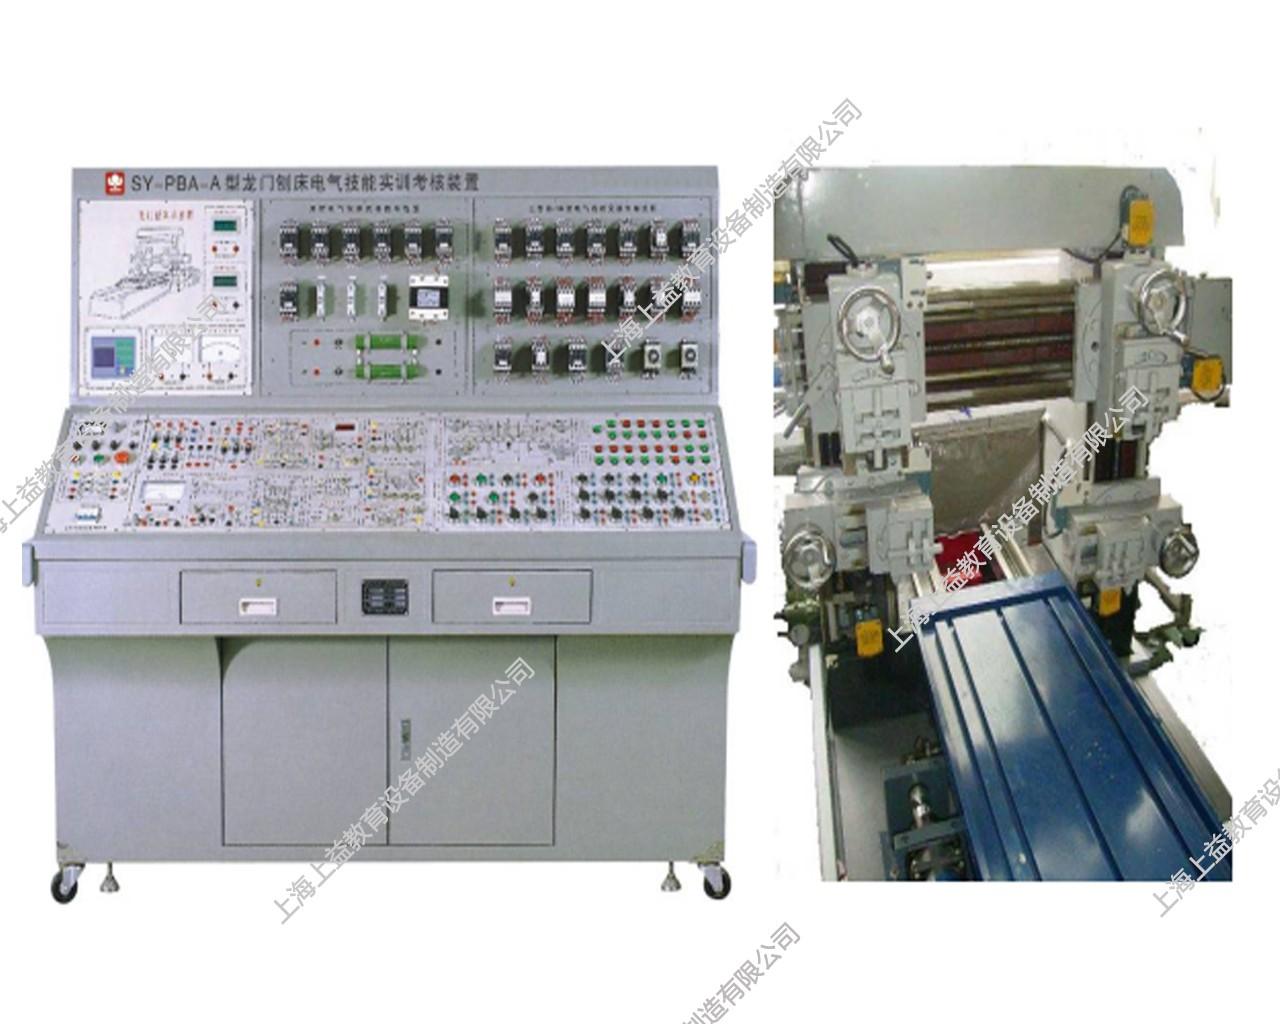 SYBS-LMB2型 龙门刨床电气技能wwwlehu8viplehu68vip装置(半实物、变频调速、一套机组)